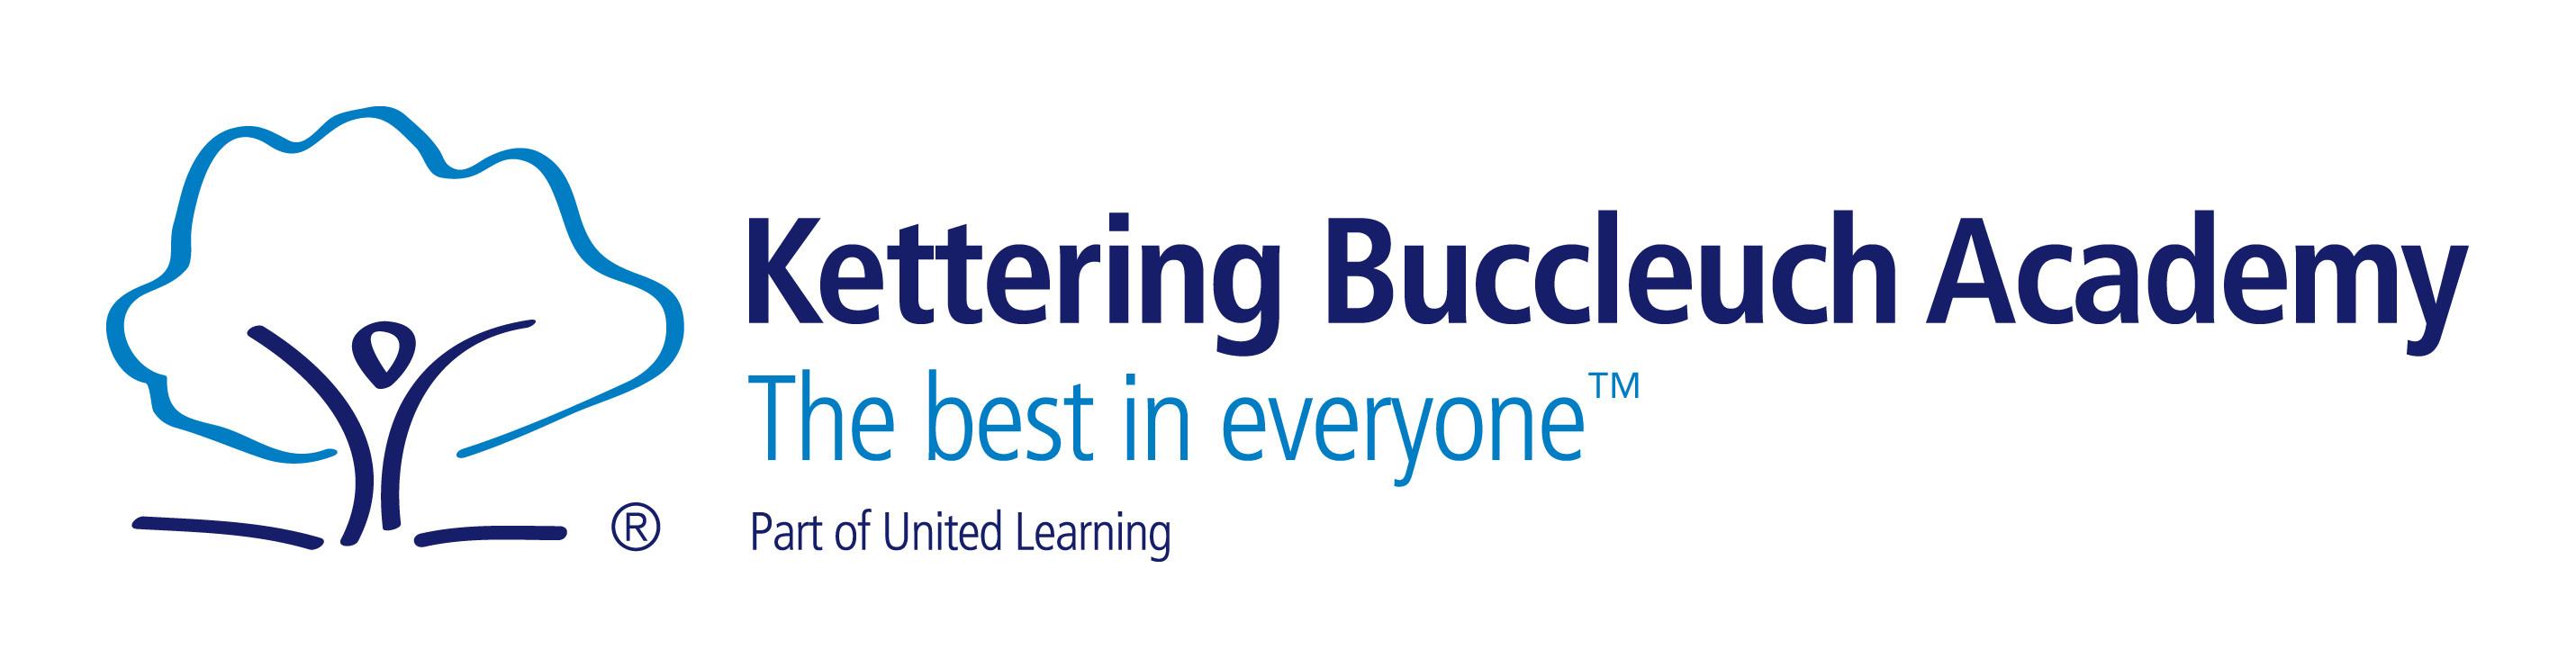 Kettering Buccleuch Academy Logo.jpg